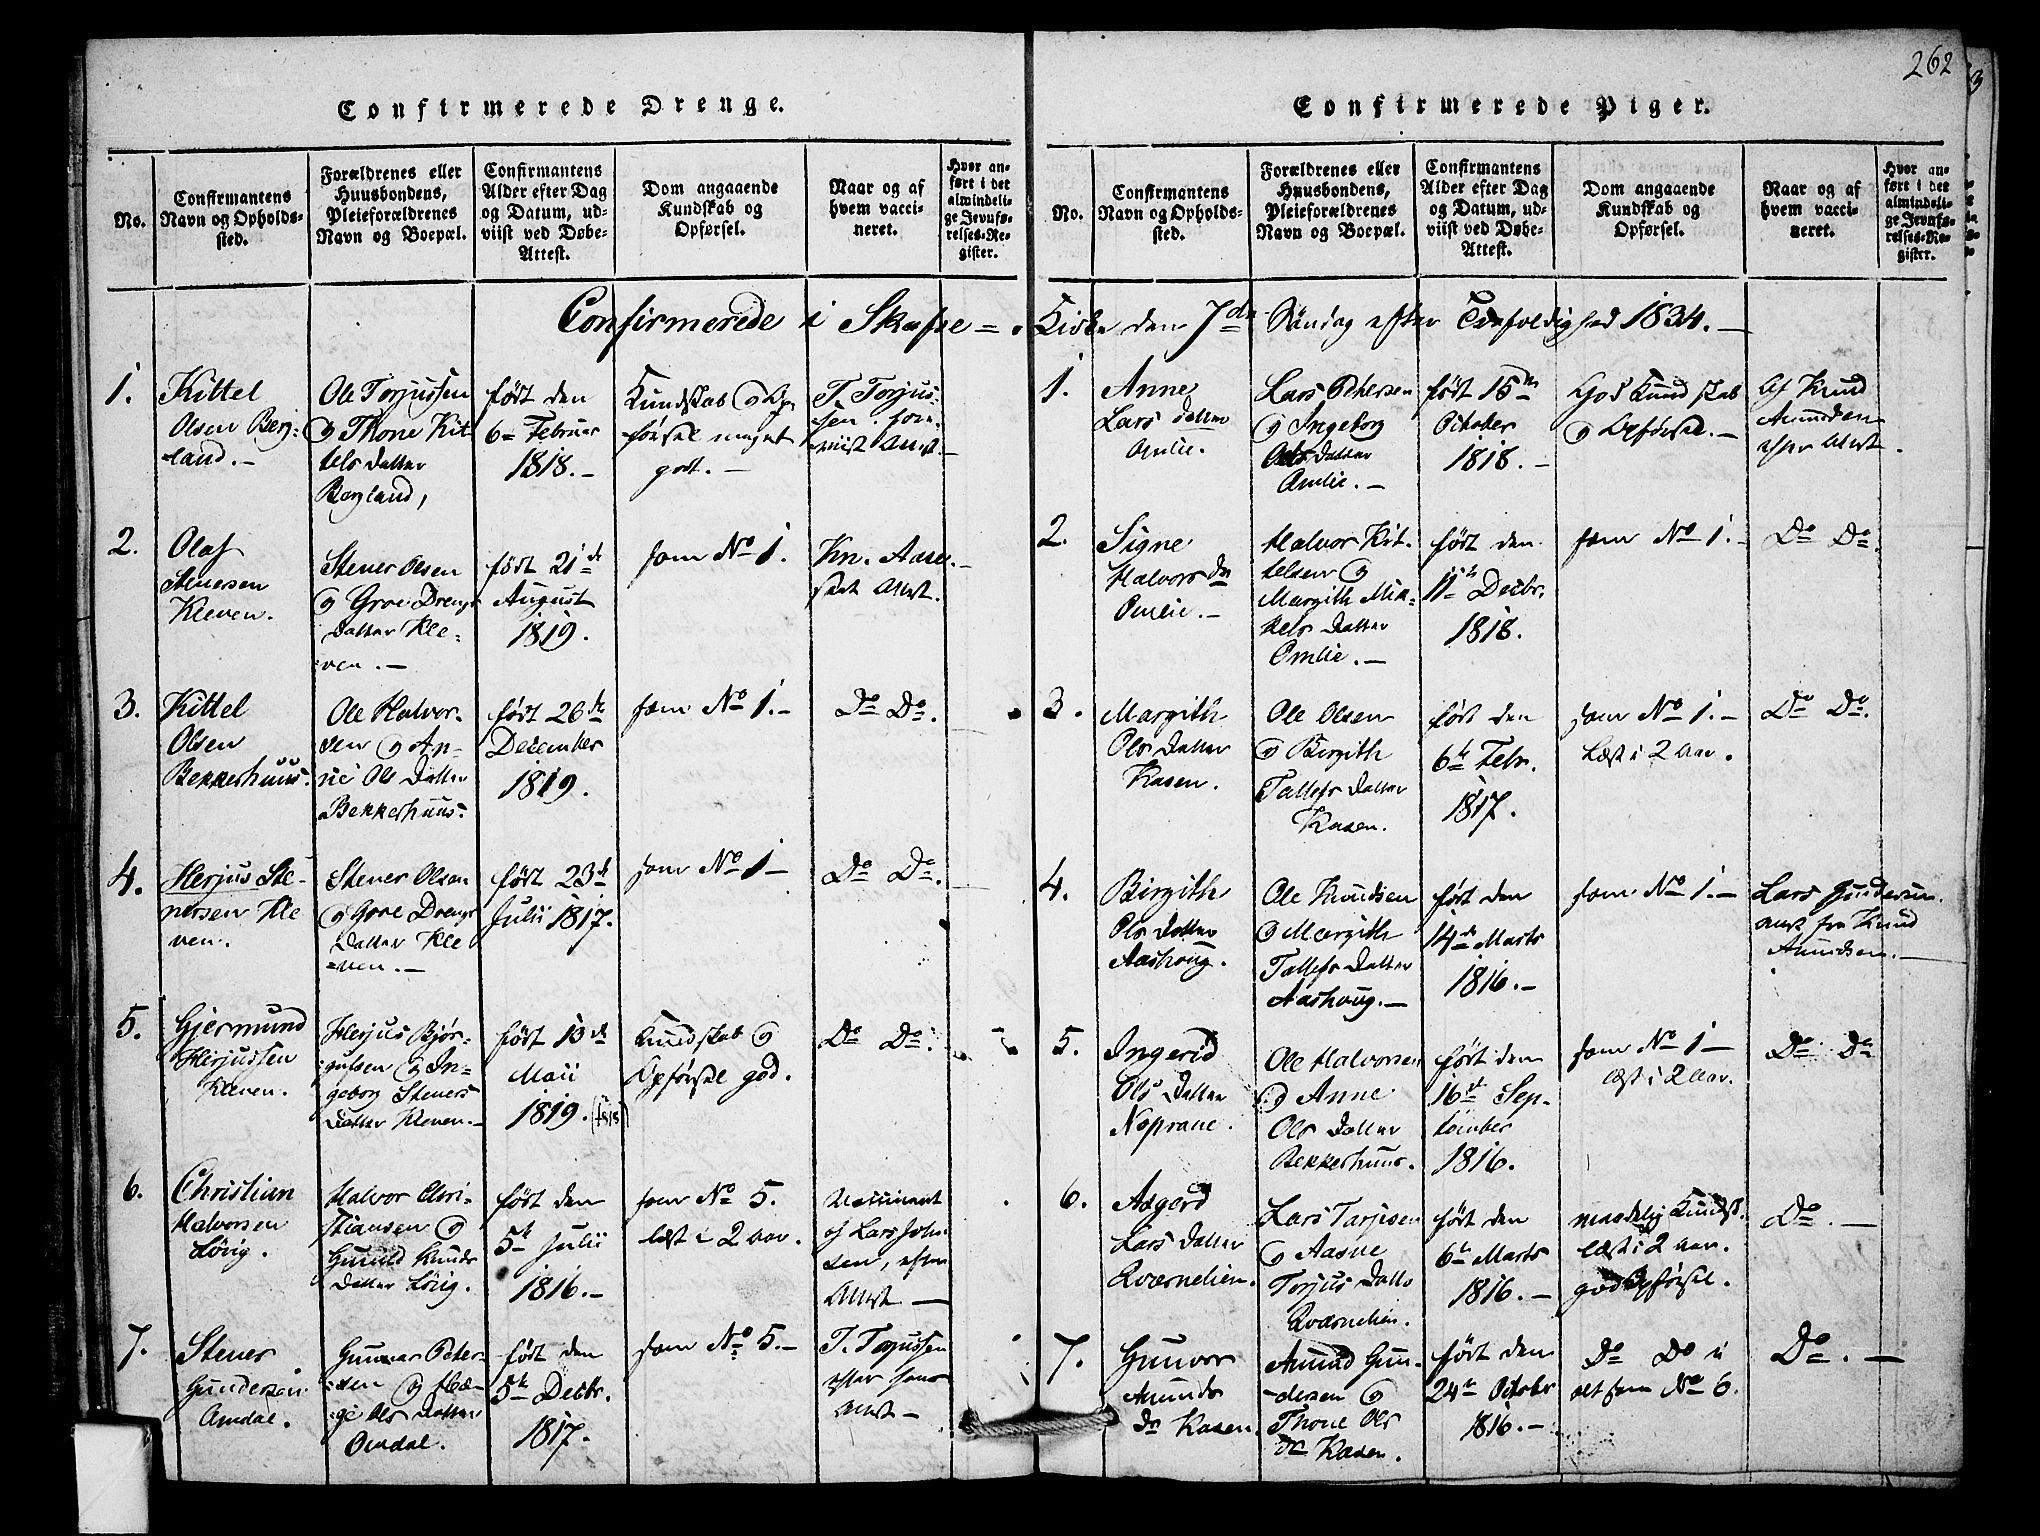 SAKO, Mo kirkebøker, F/Fb/L0001: Ministerialbok nr. II 1, 1814-1844, s. 262